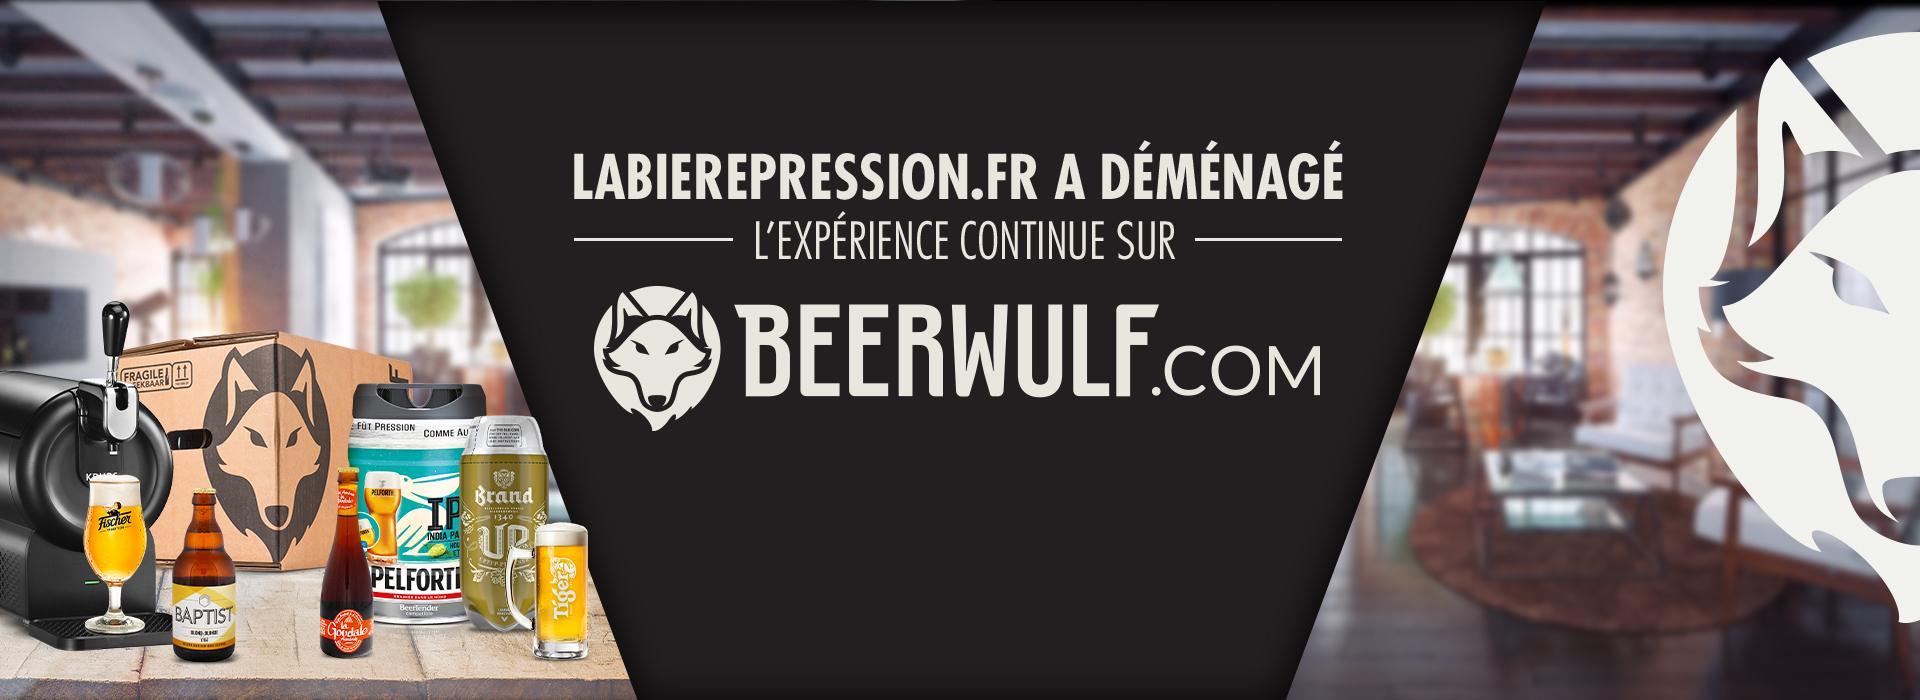 https://www.labierepression.fr/cadeaux/ - desktop